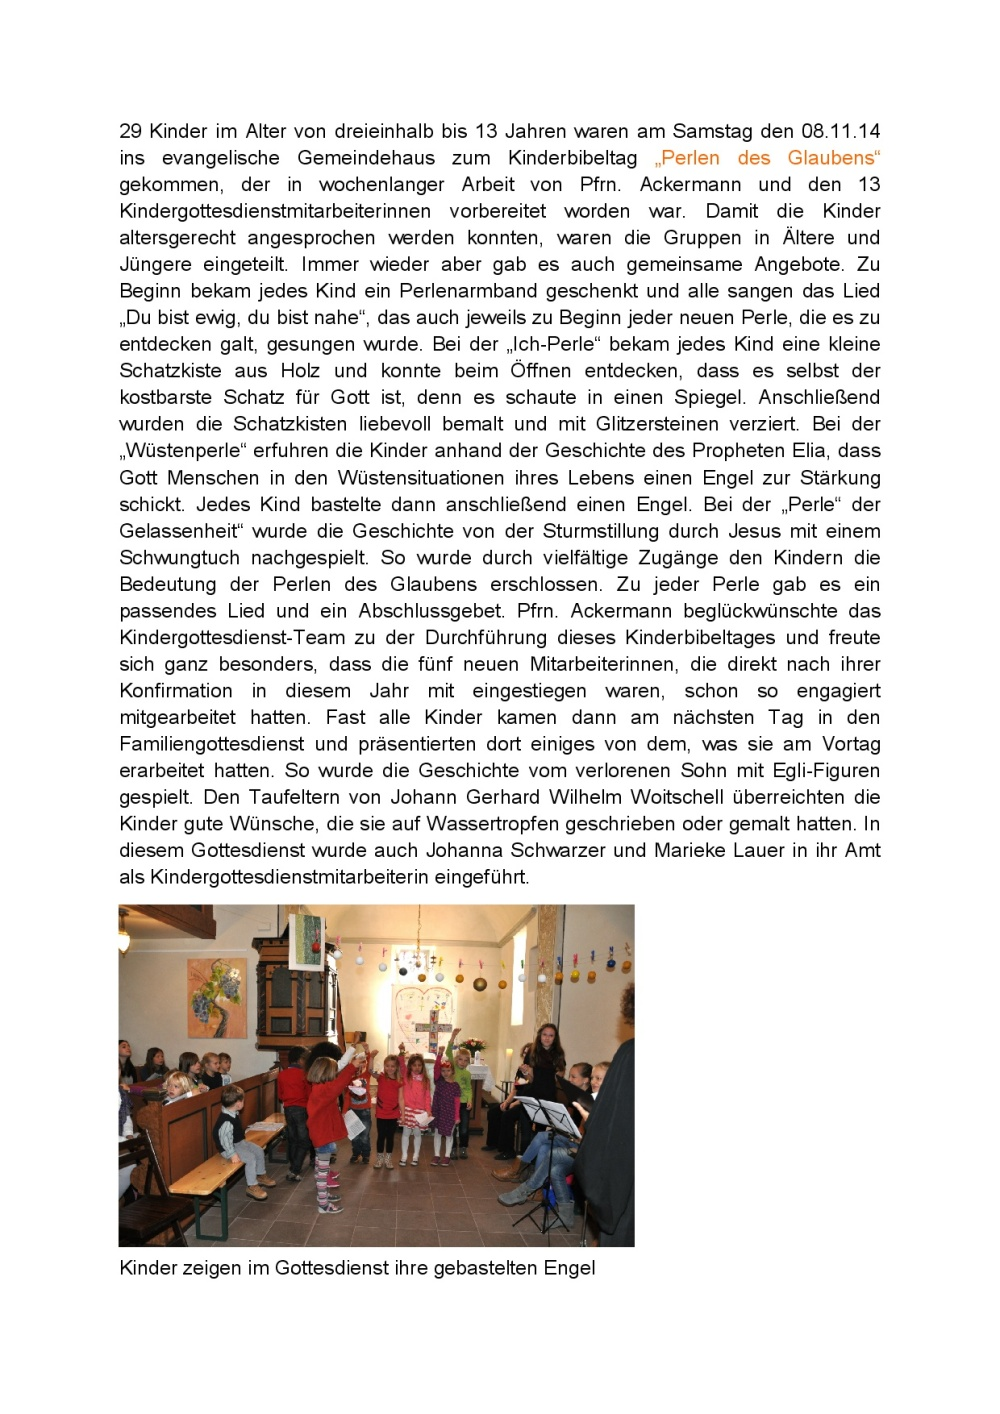 33- Kinderbibeltag und Fam.godi 08.11.14-001